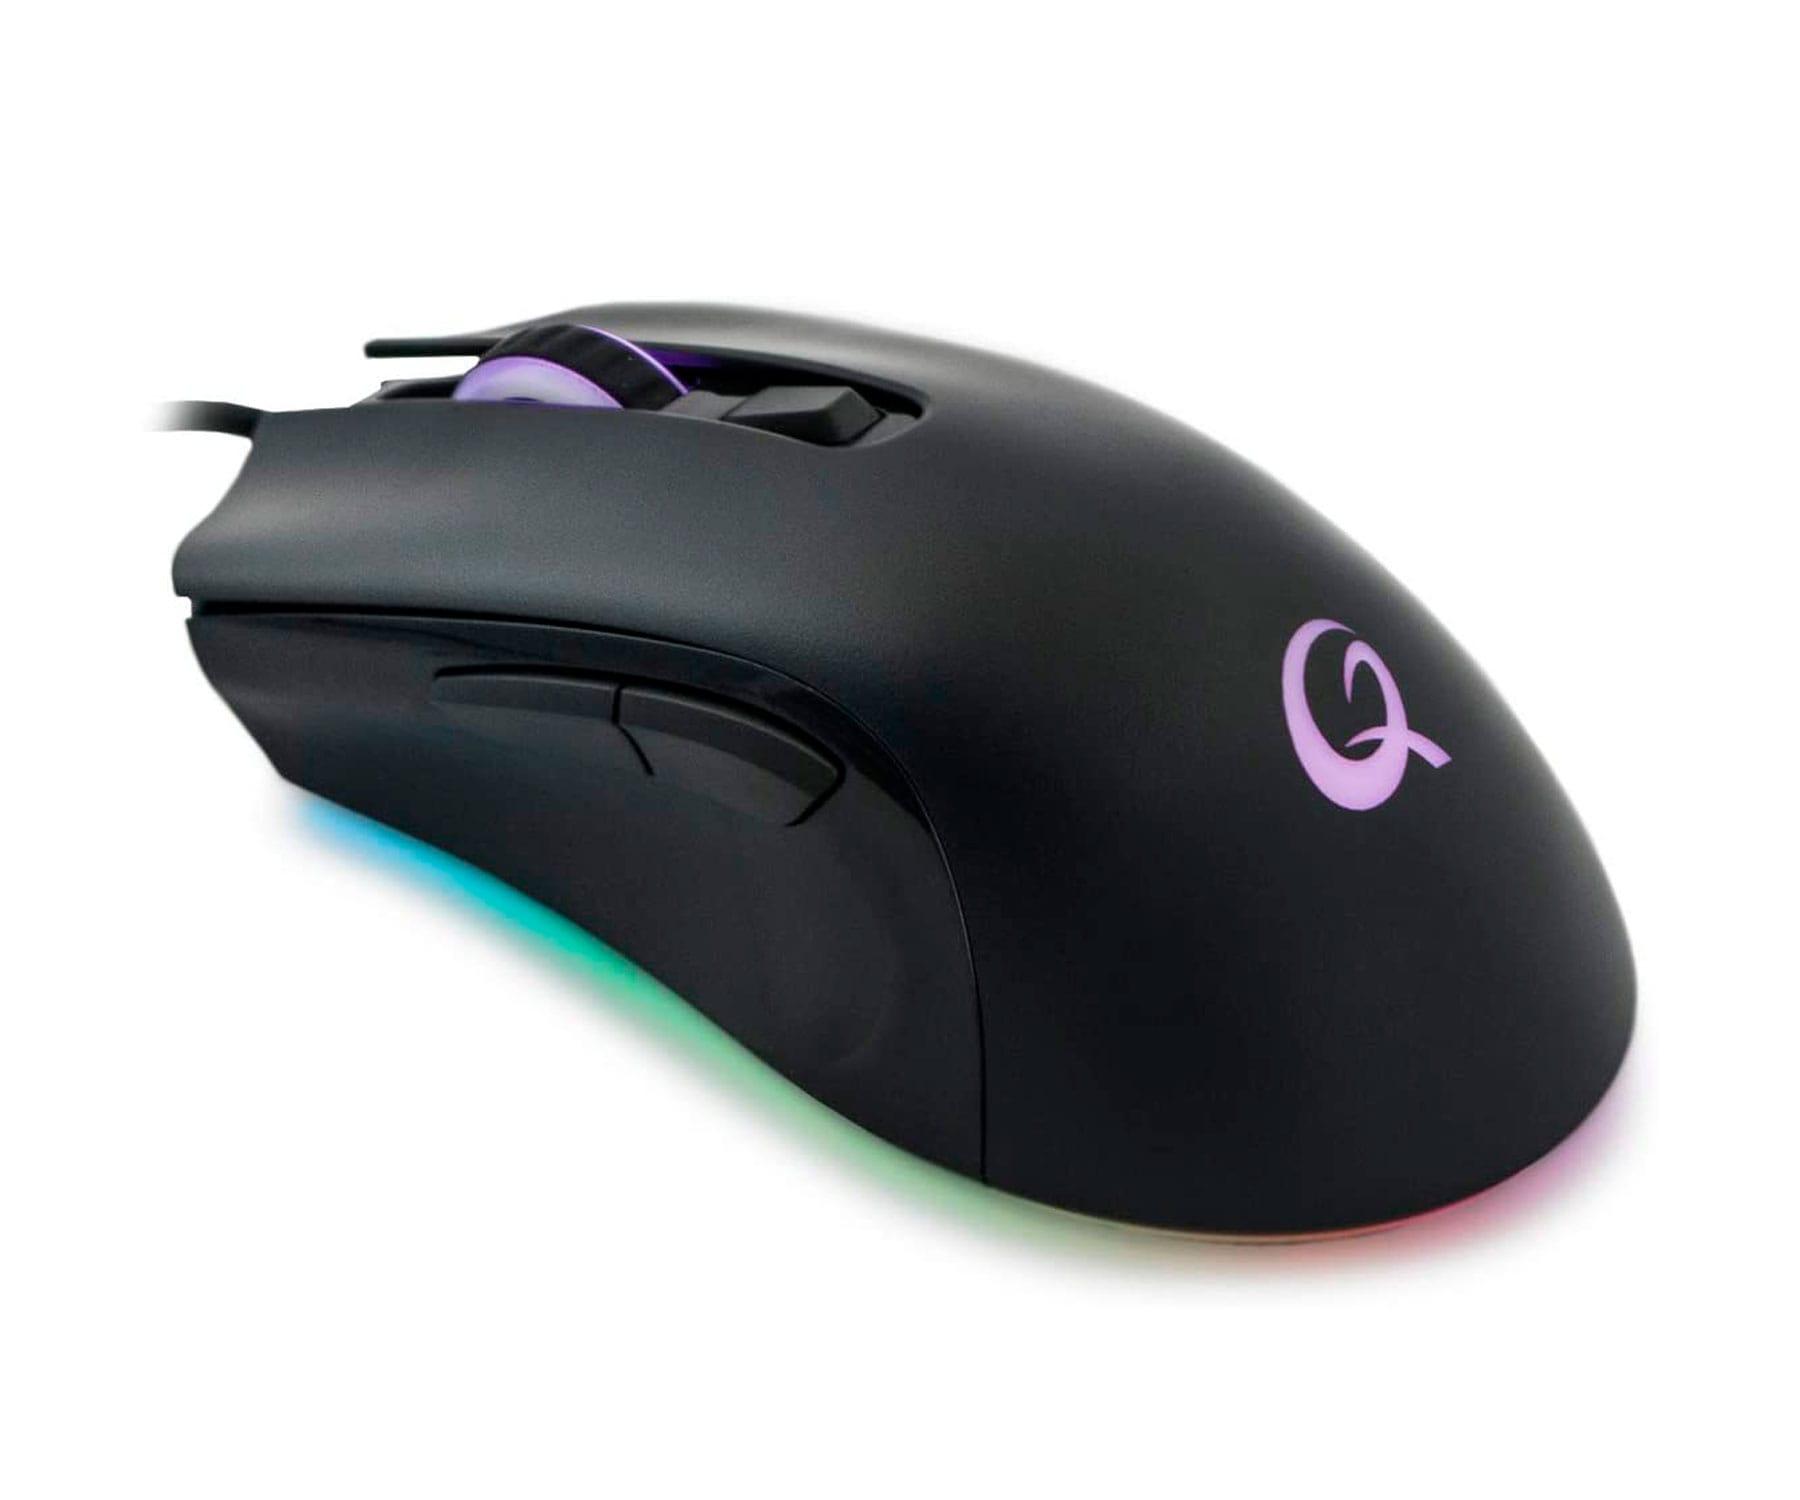 Qpad DX120 Negro/Ratón gaming/Led RGB/6 teclas/12000dpi/Diestro